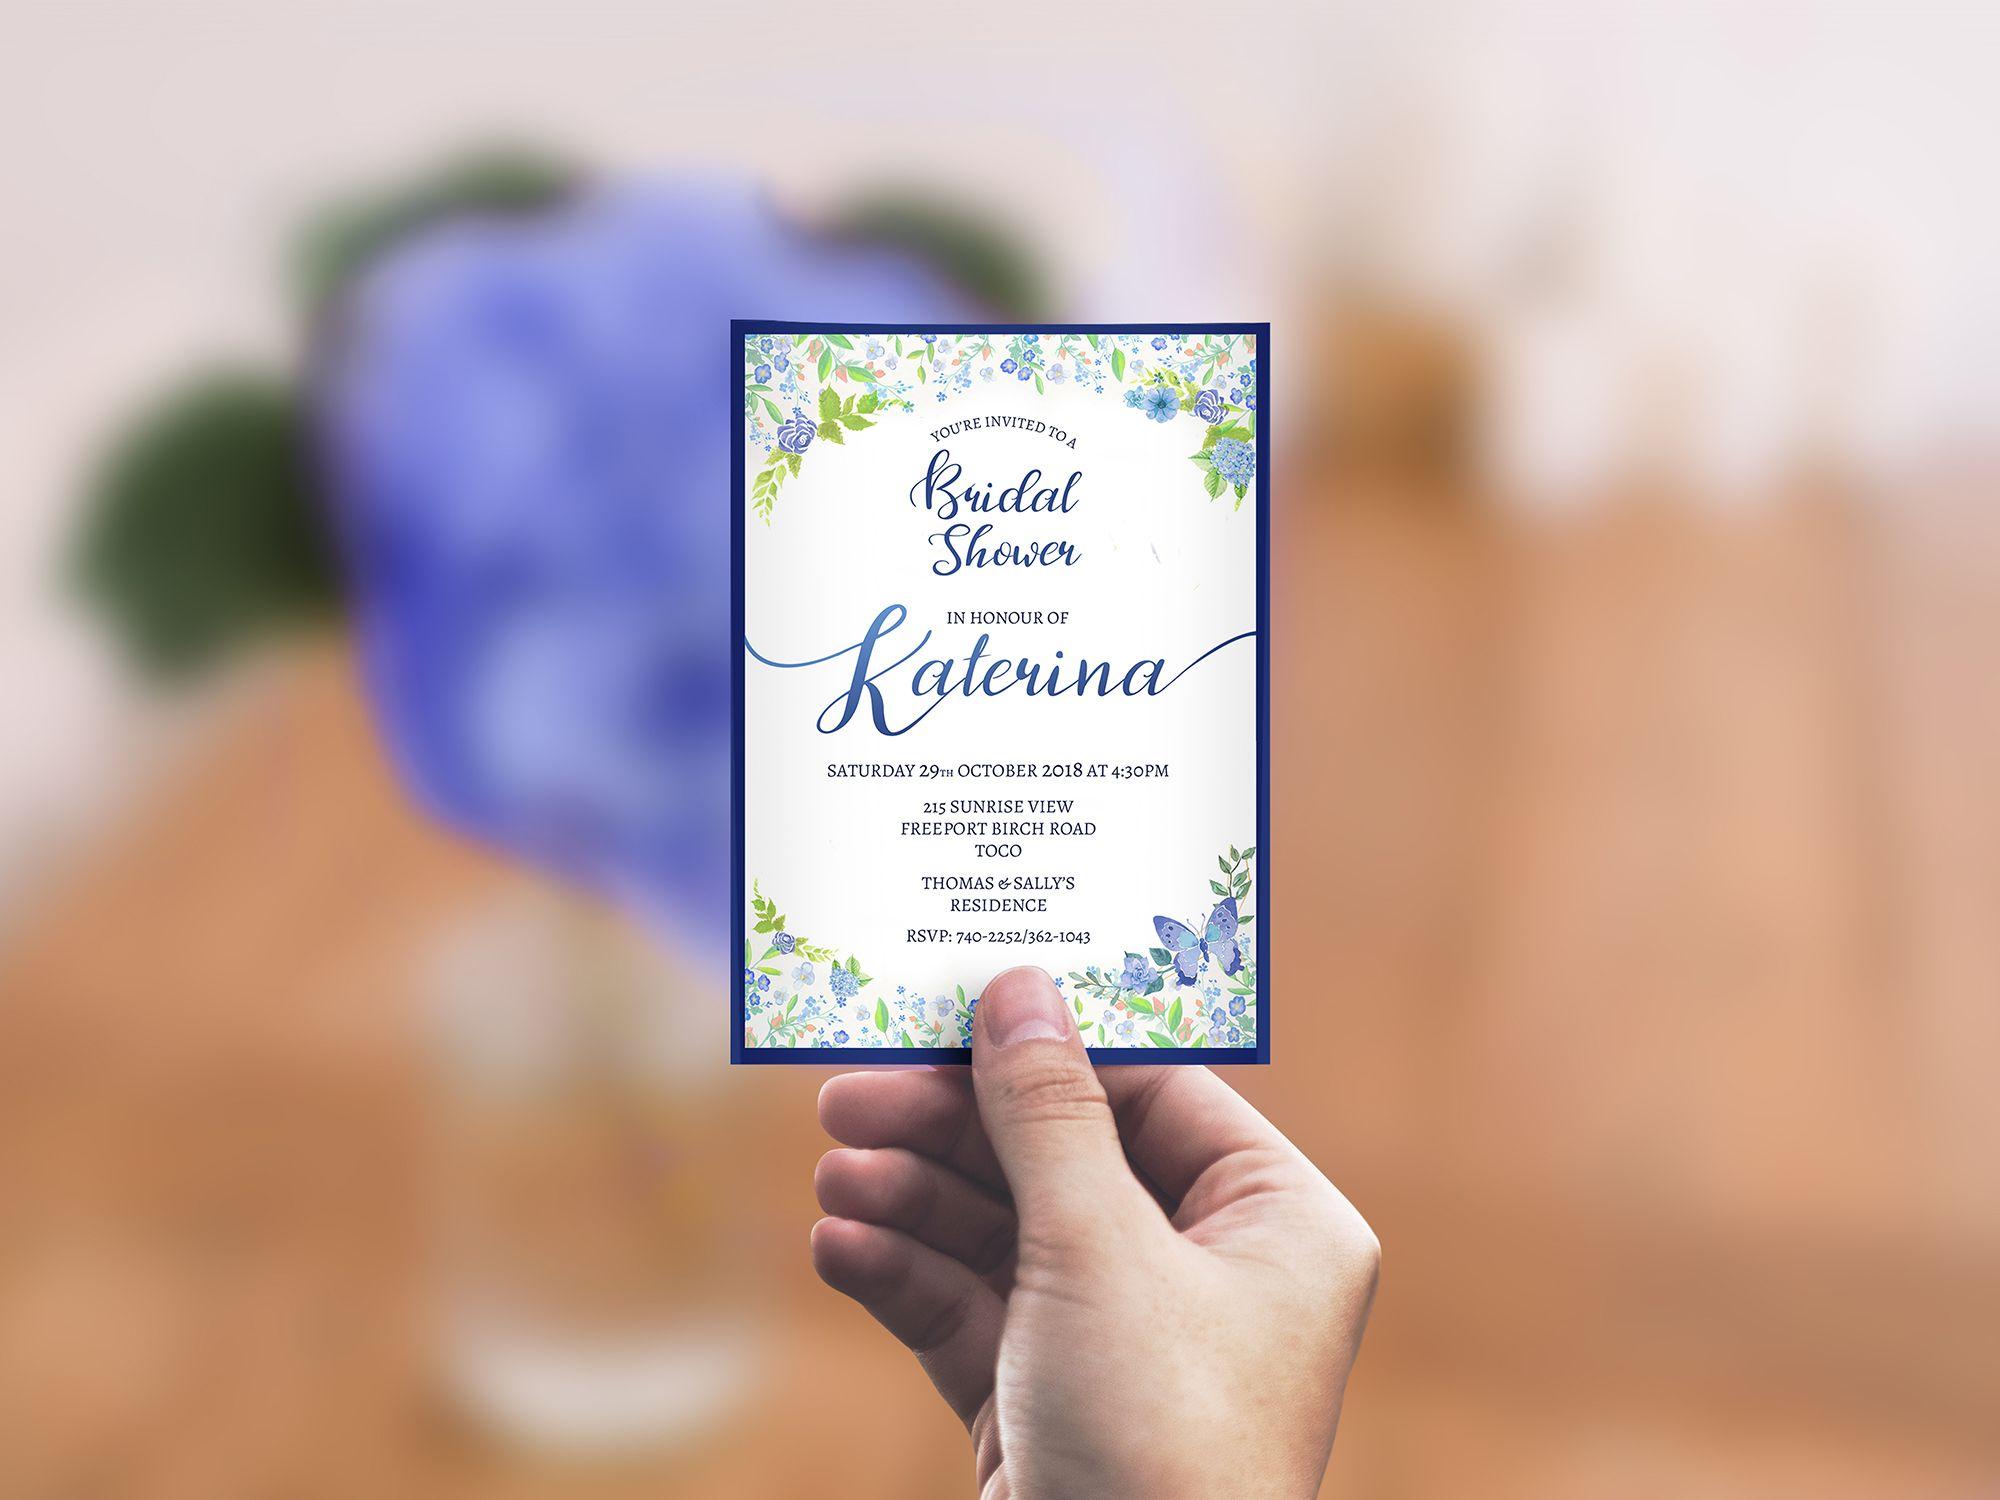 Katerina's Bridal Shower Invitation in hand